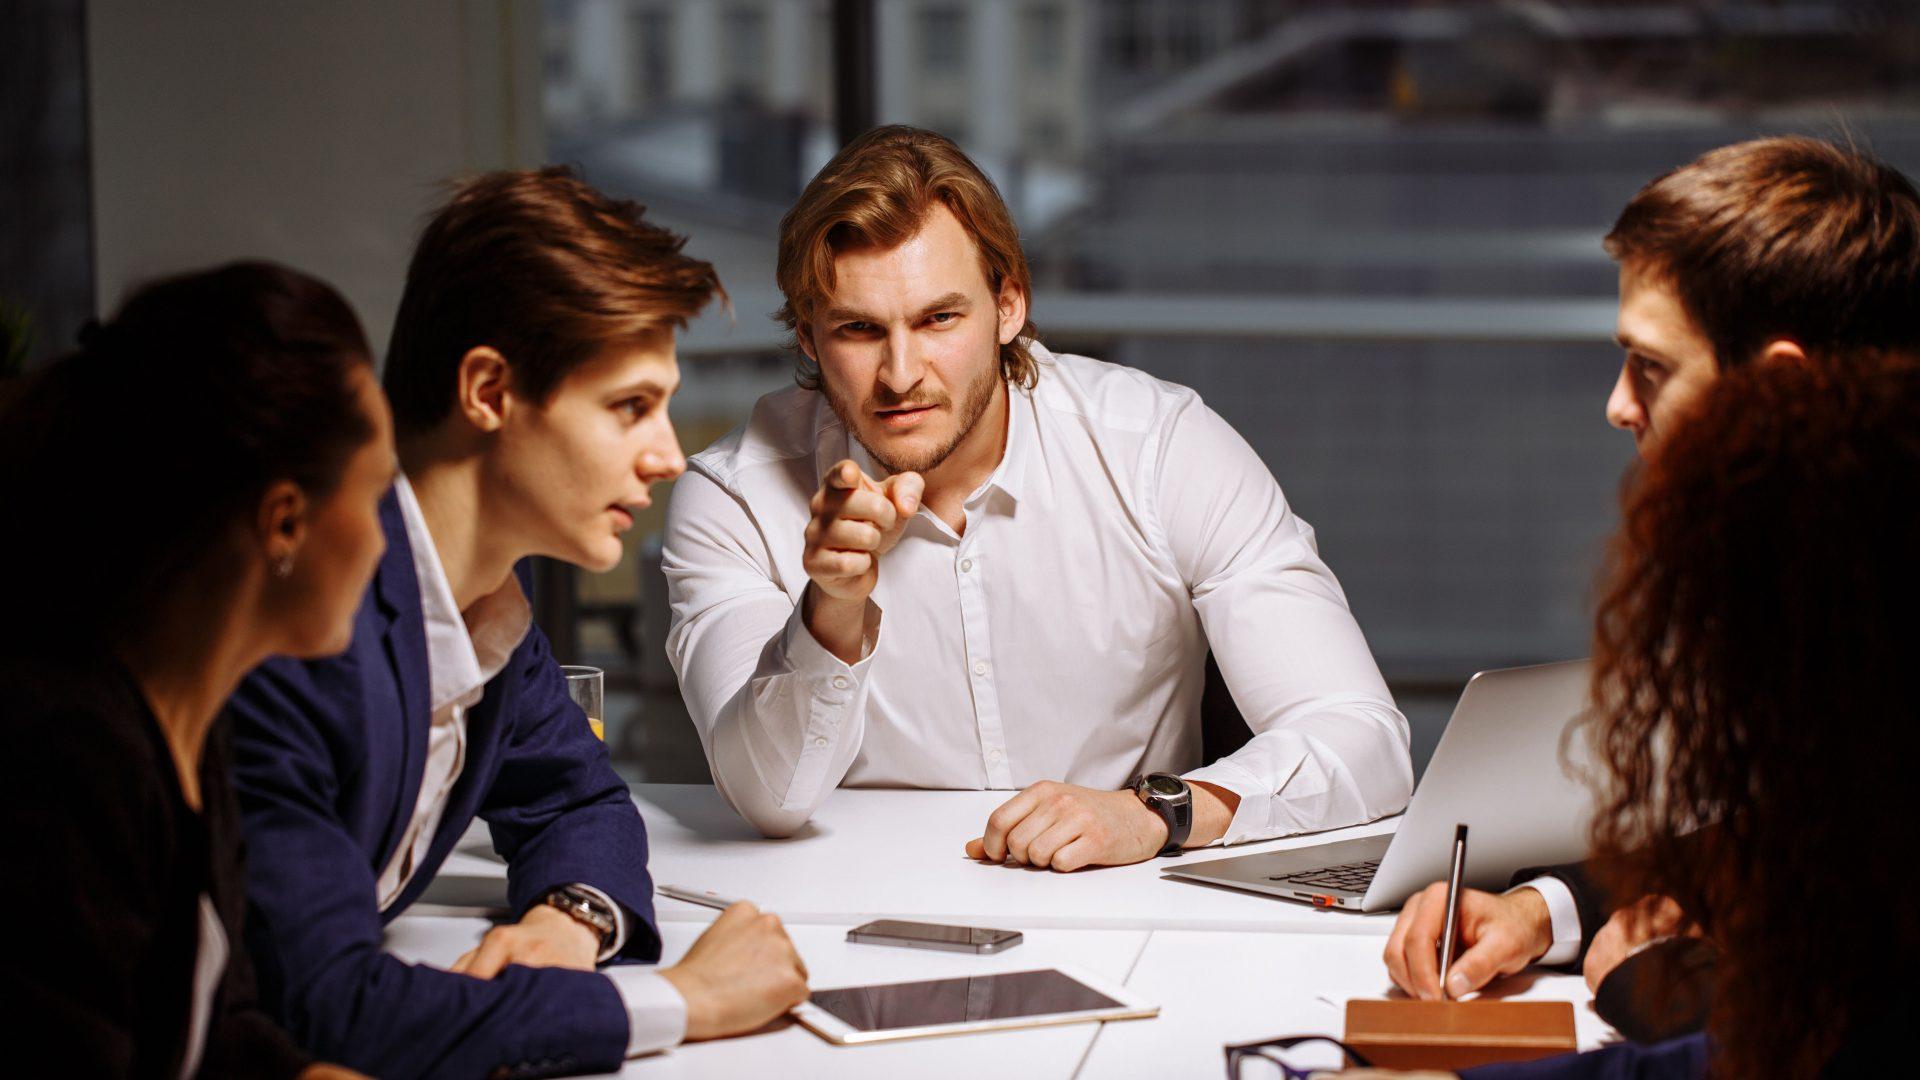 Residence-Based mostly Enterprise Entrepreneur Working At Residence